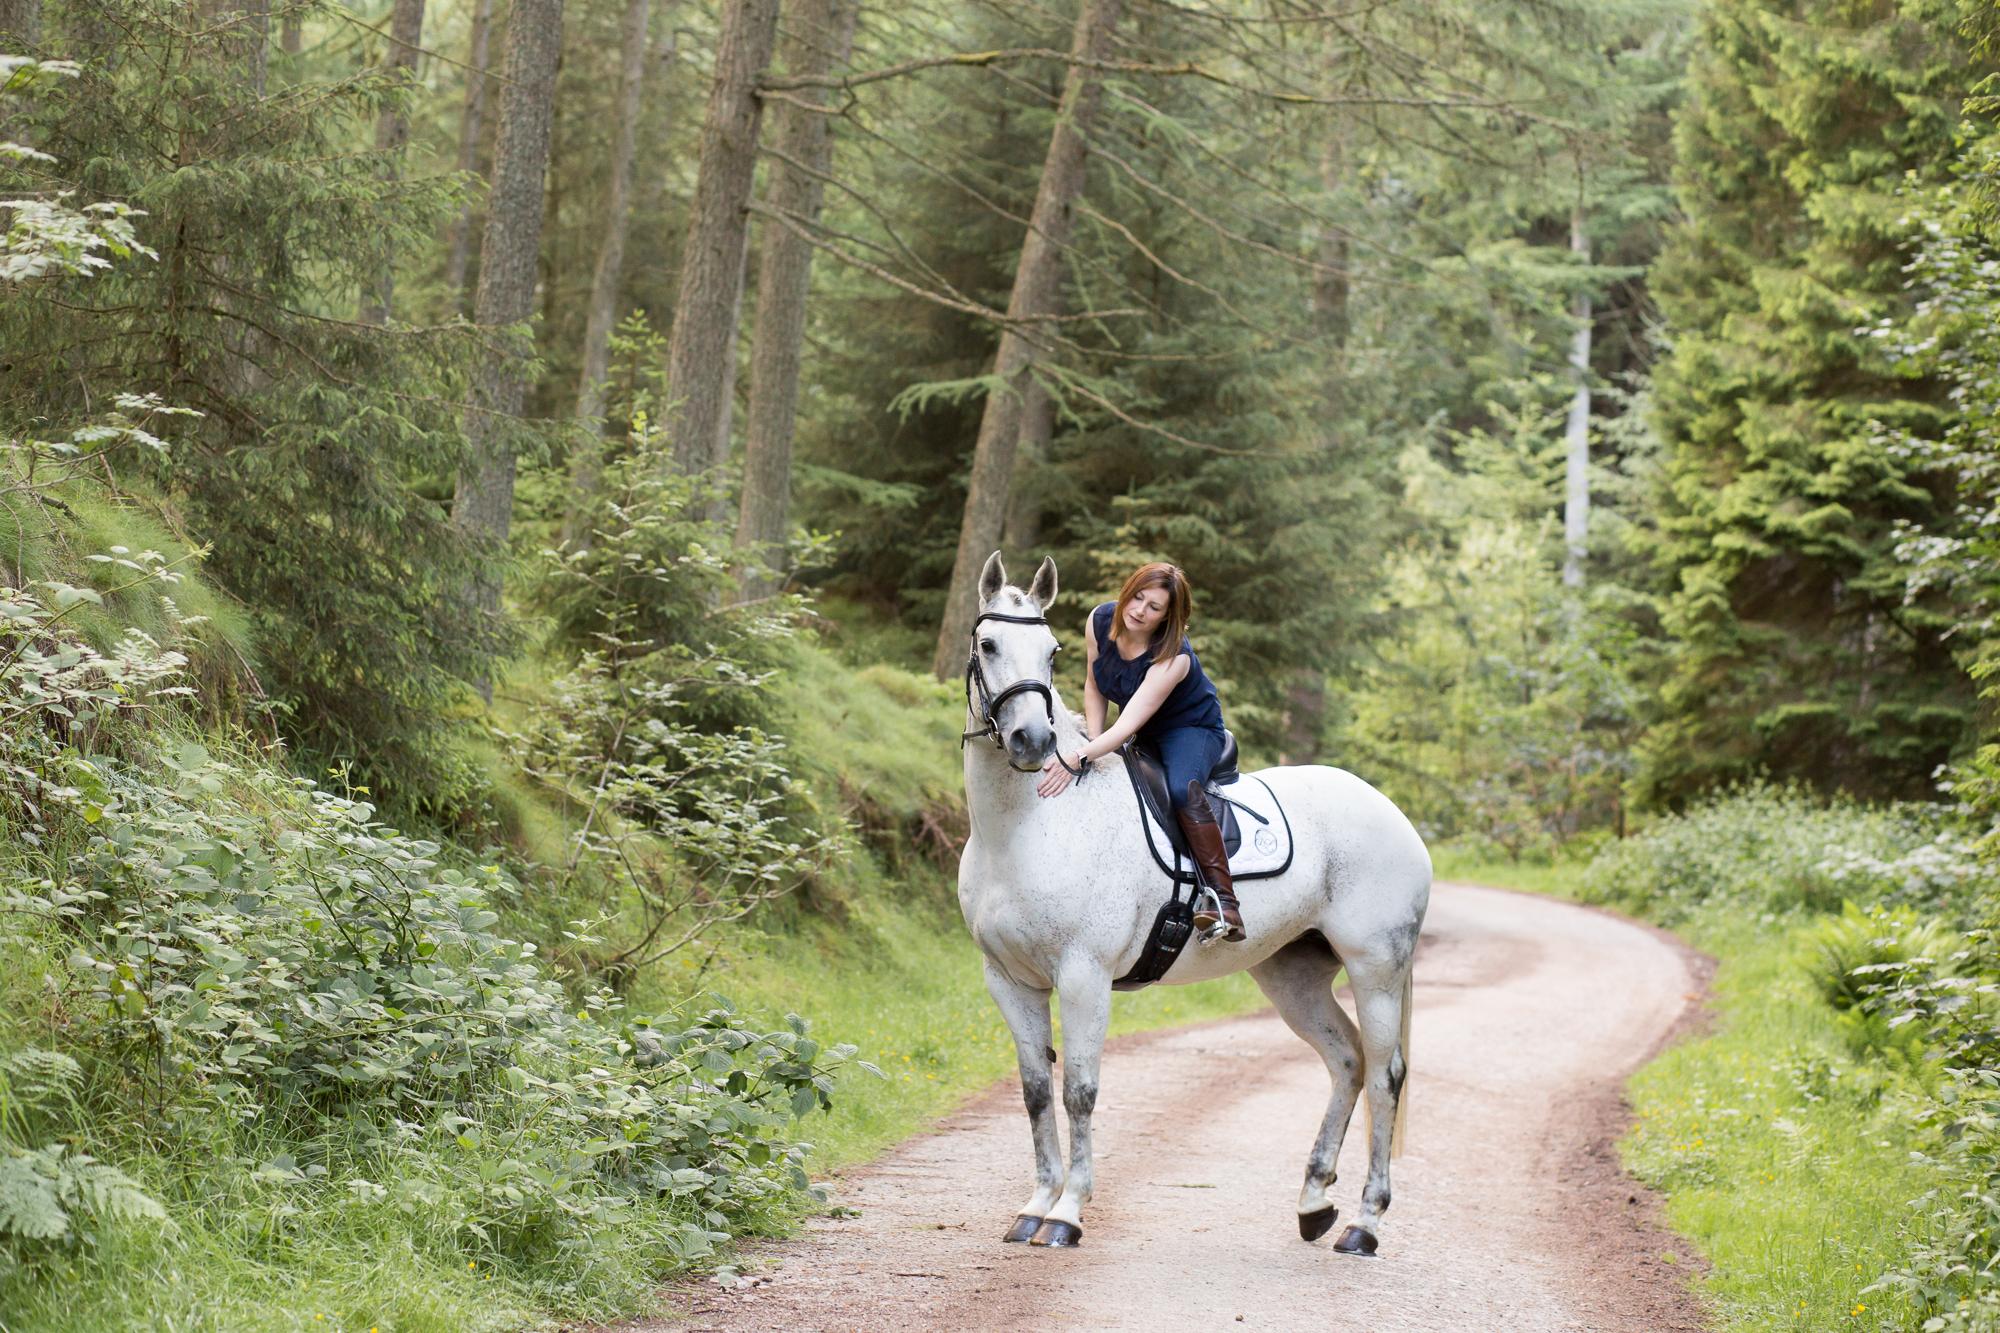 equine photographer aberdeen, horse photographer Aberdeen, equine photography Aberdeenshire, Vivienne elizabeth photography, horse photos Aberdeen, kirkhill forest,